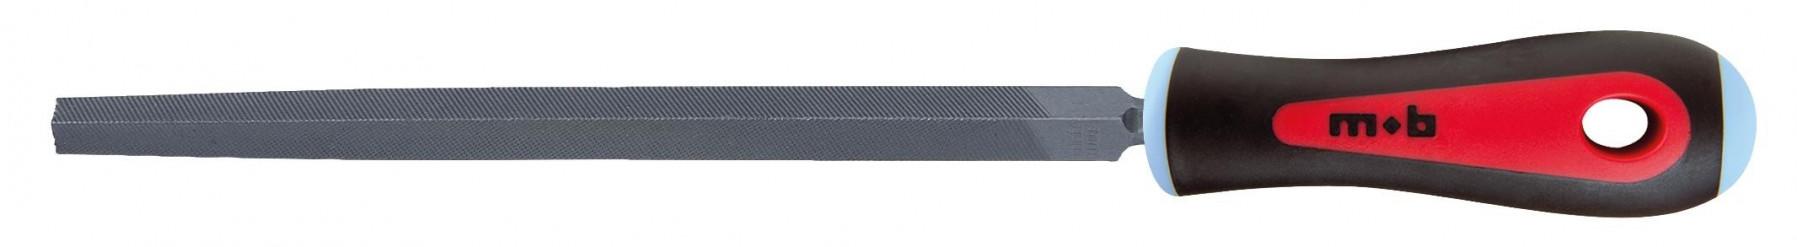 Lime triangle 912 mi-douce MOB MONDELIN 200 x 15 mm - 0912206201